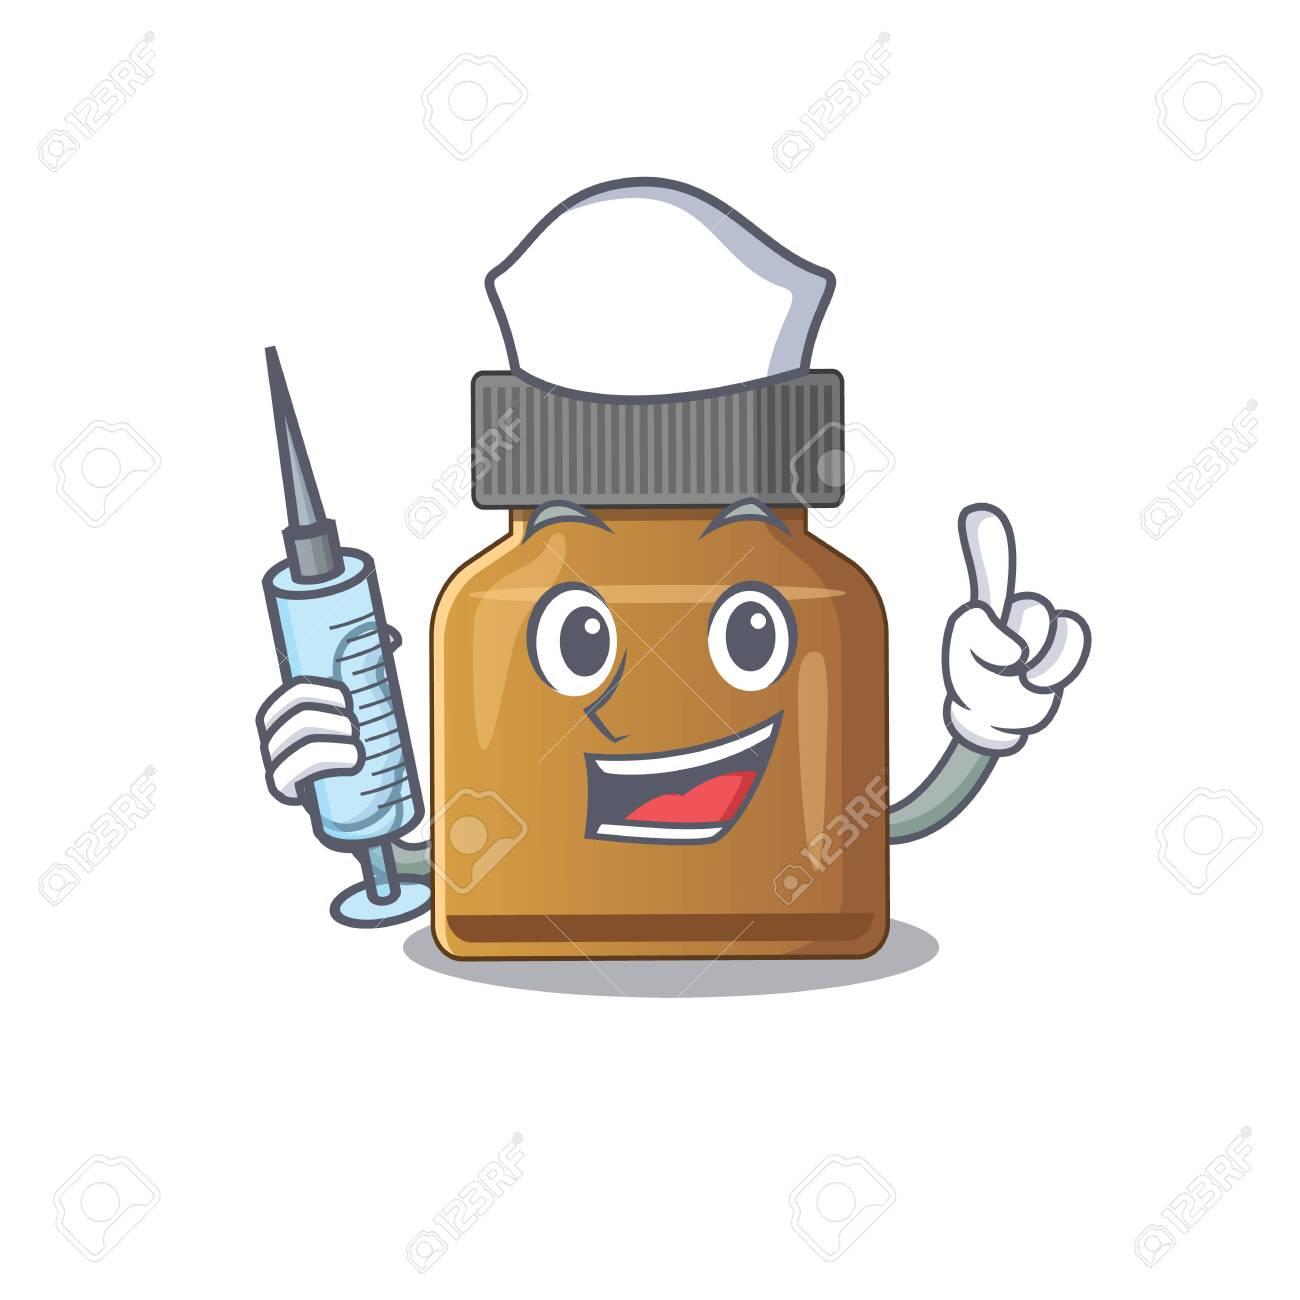 Bottle vitamin b humble nurse mascot design with a syringe. Vector illustration - 150919700